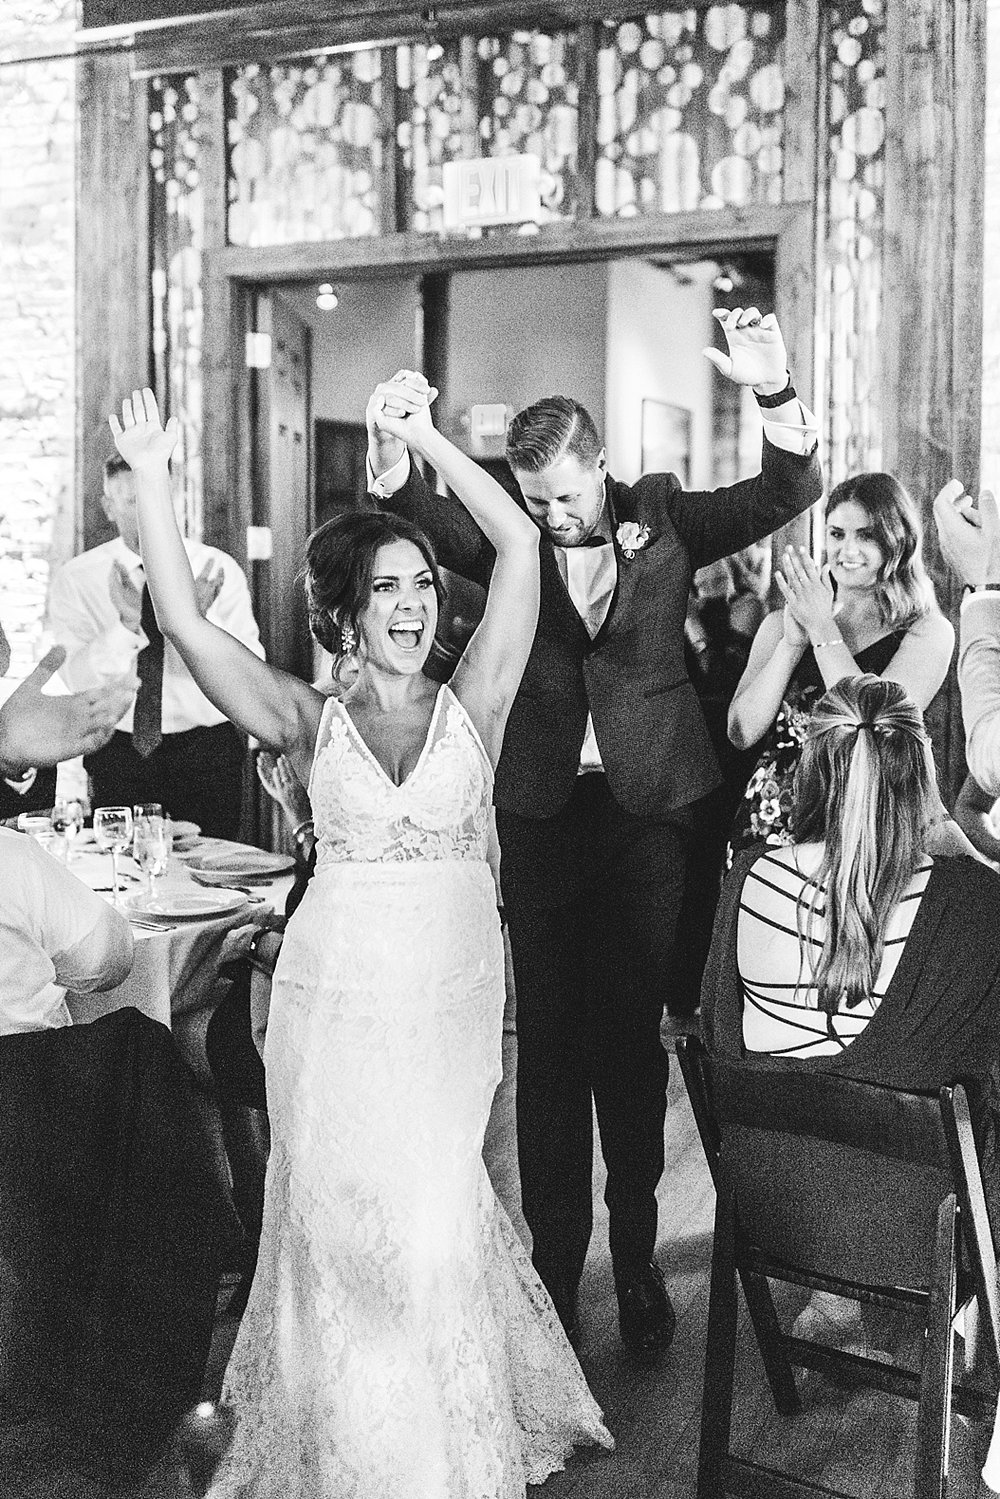 Cuvee Wedding - guhl_0099.jpg